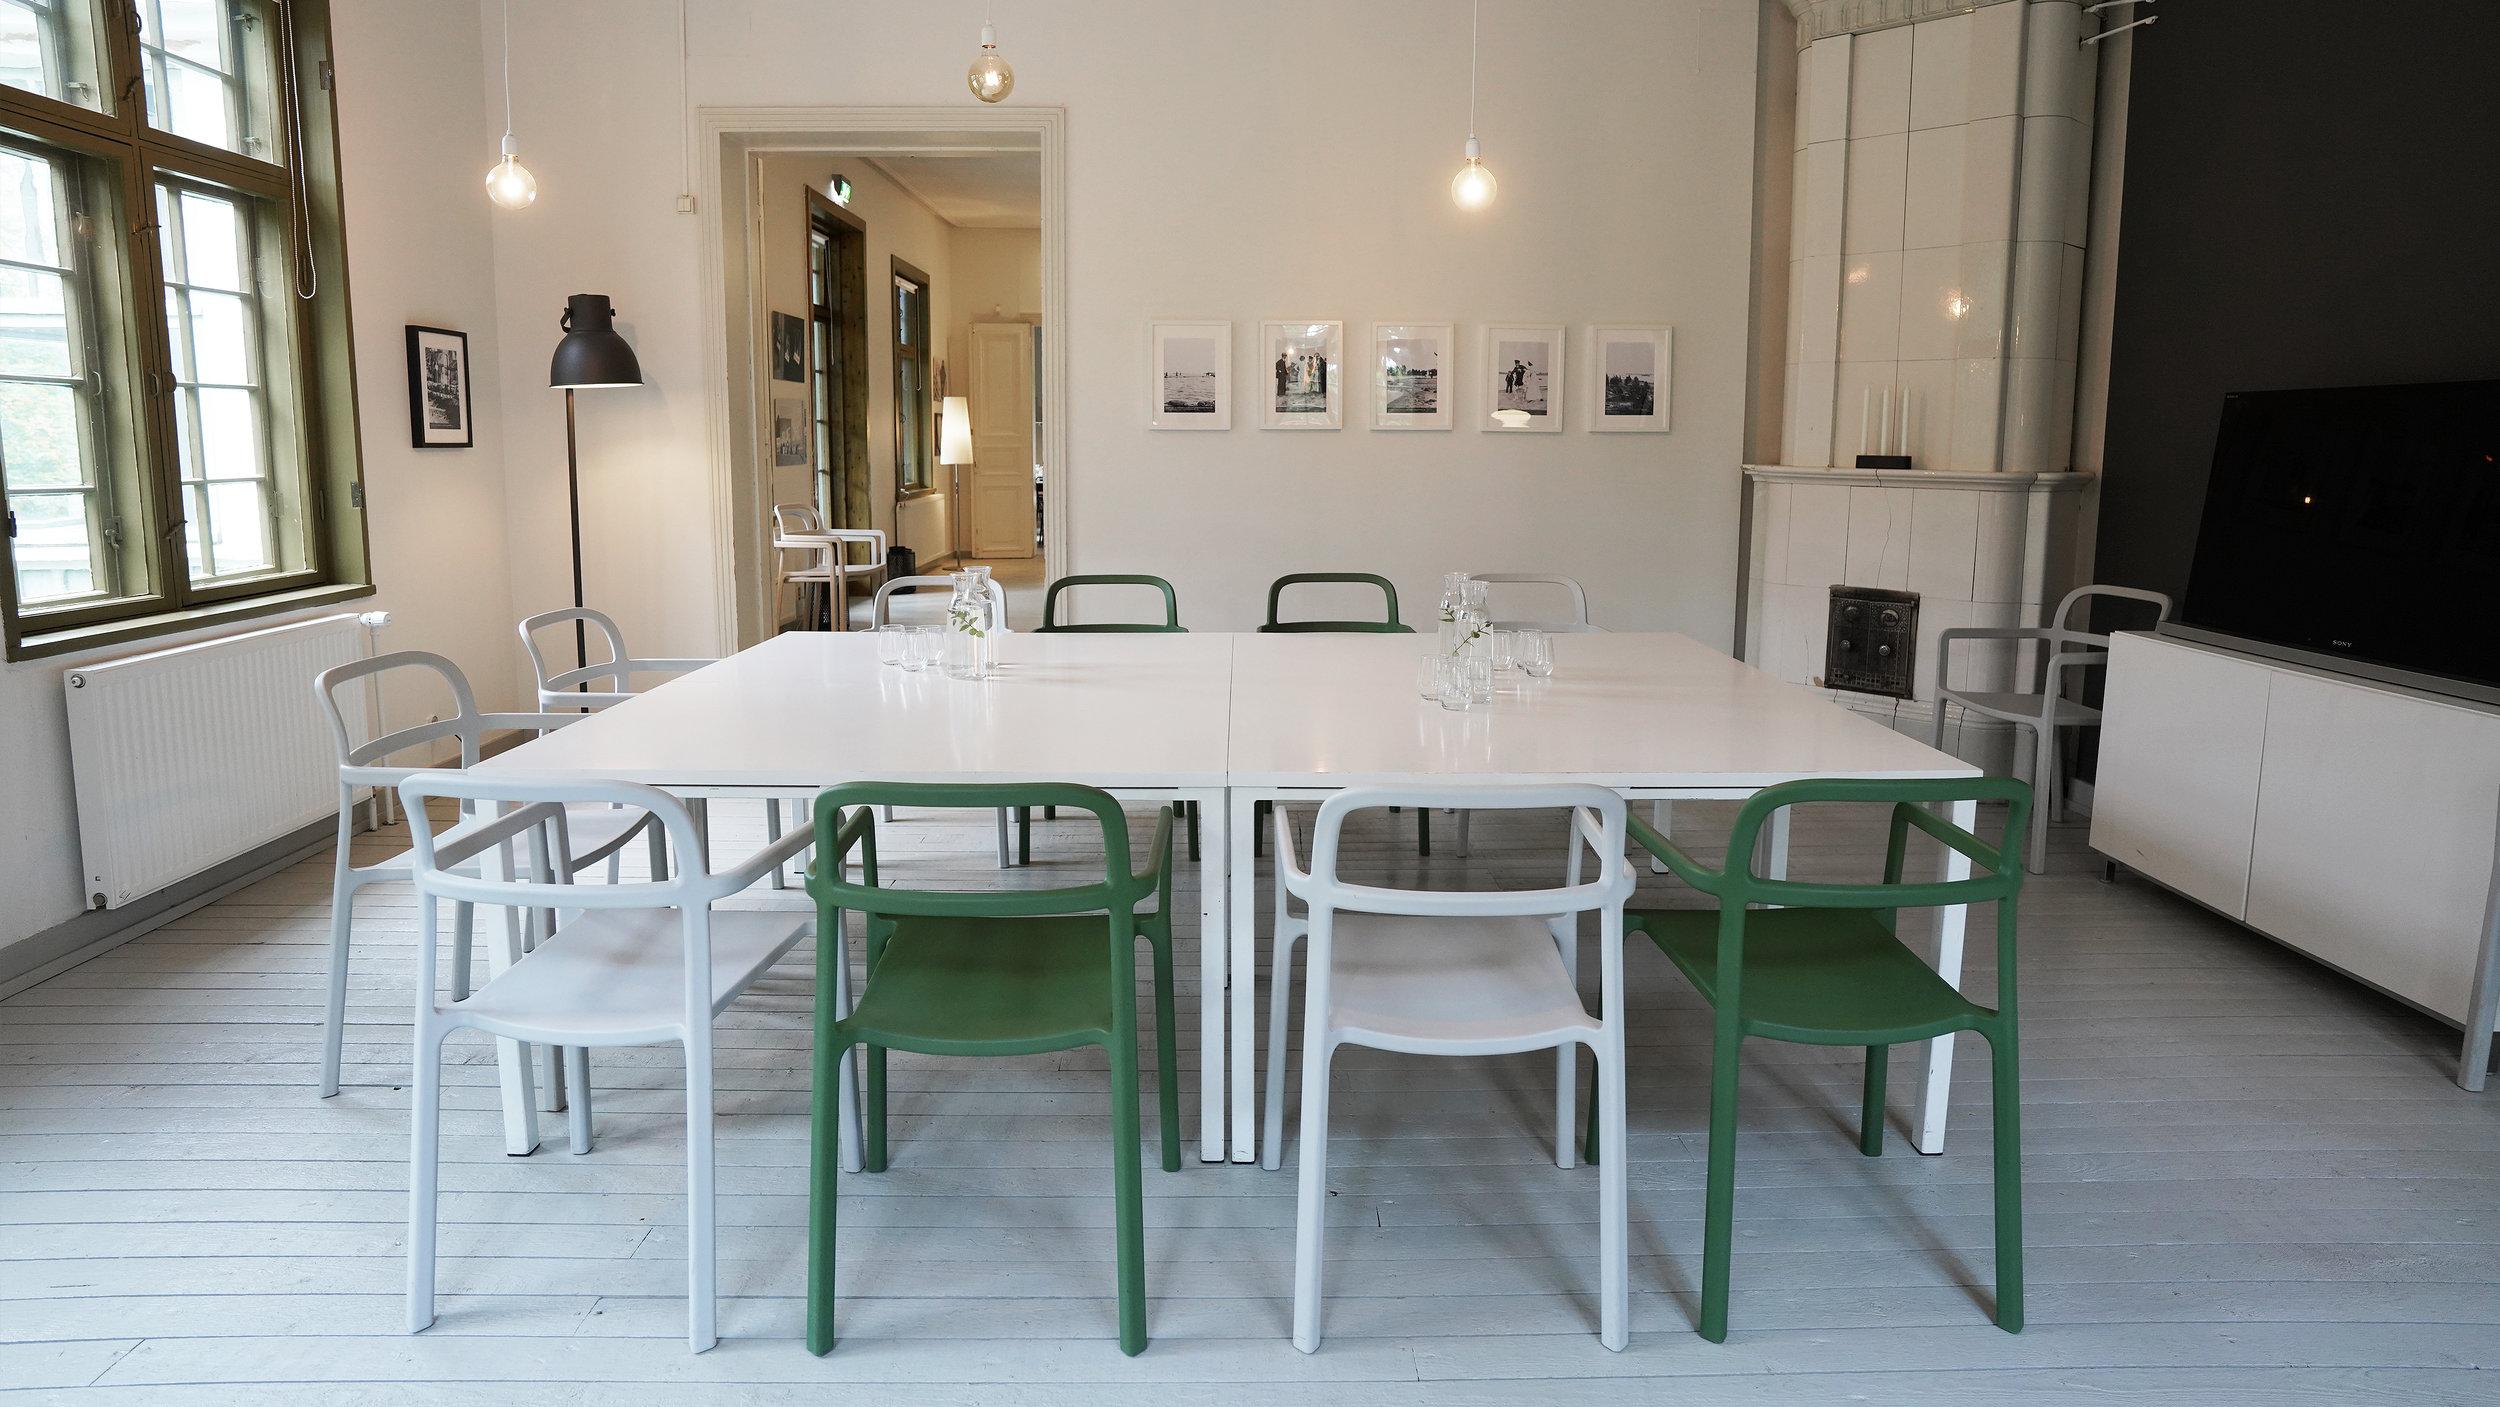 Cafe Monami - Agronomi sali 2